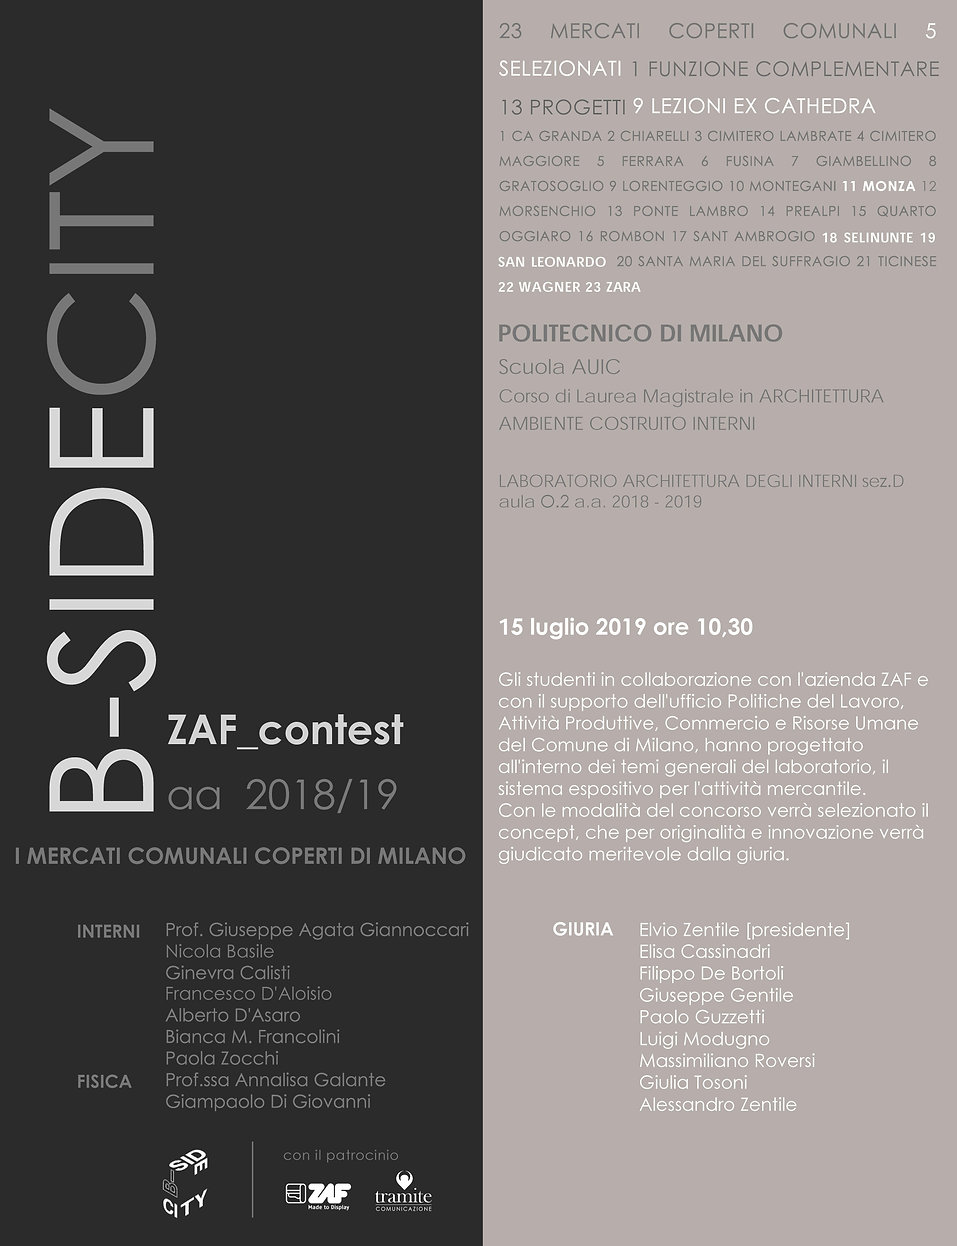 locandina concorso zaf ridotto.jpg